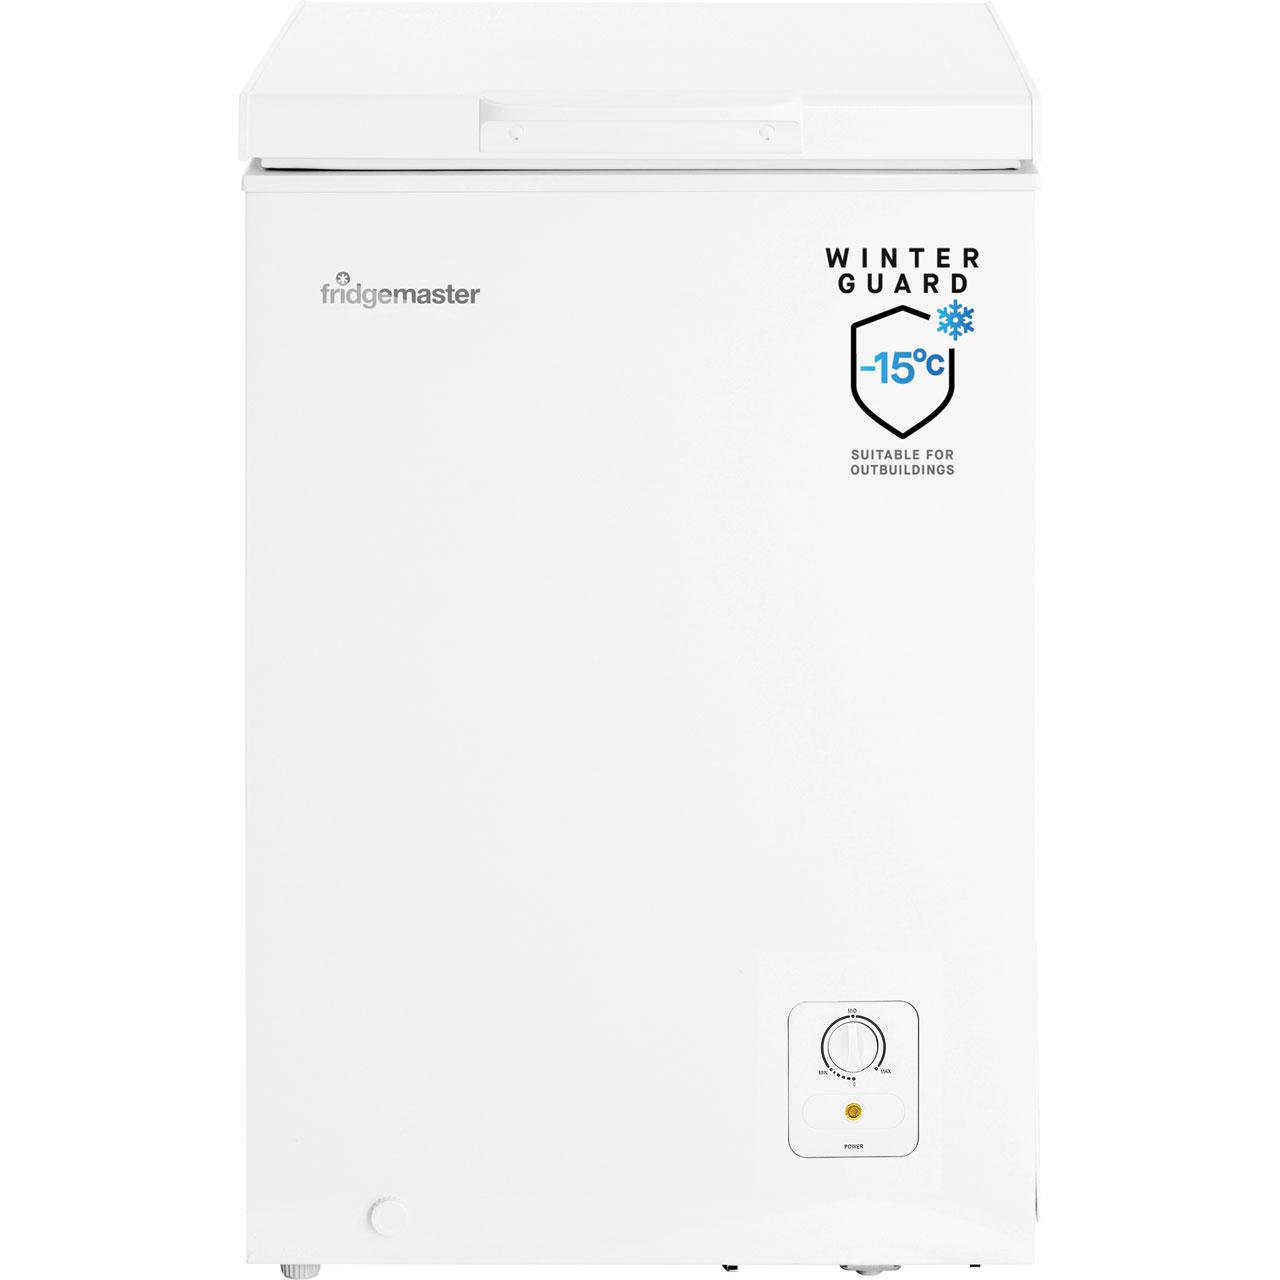 mcf95 wh fridgemaster chest freezer ao ThinkPad Support